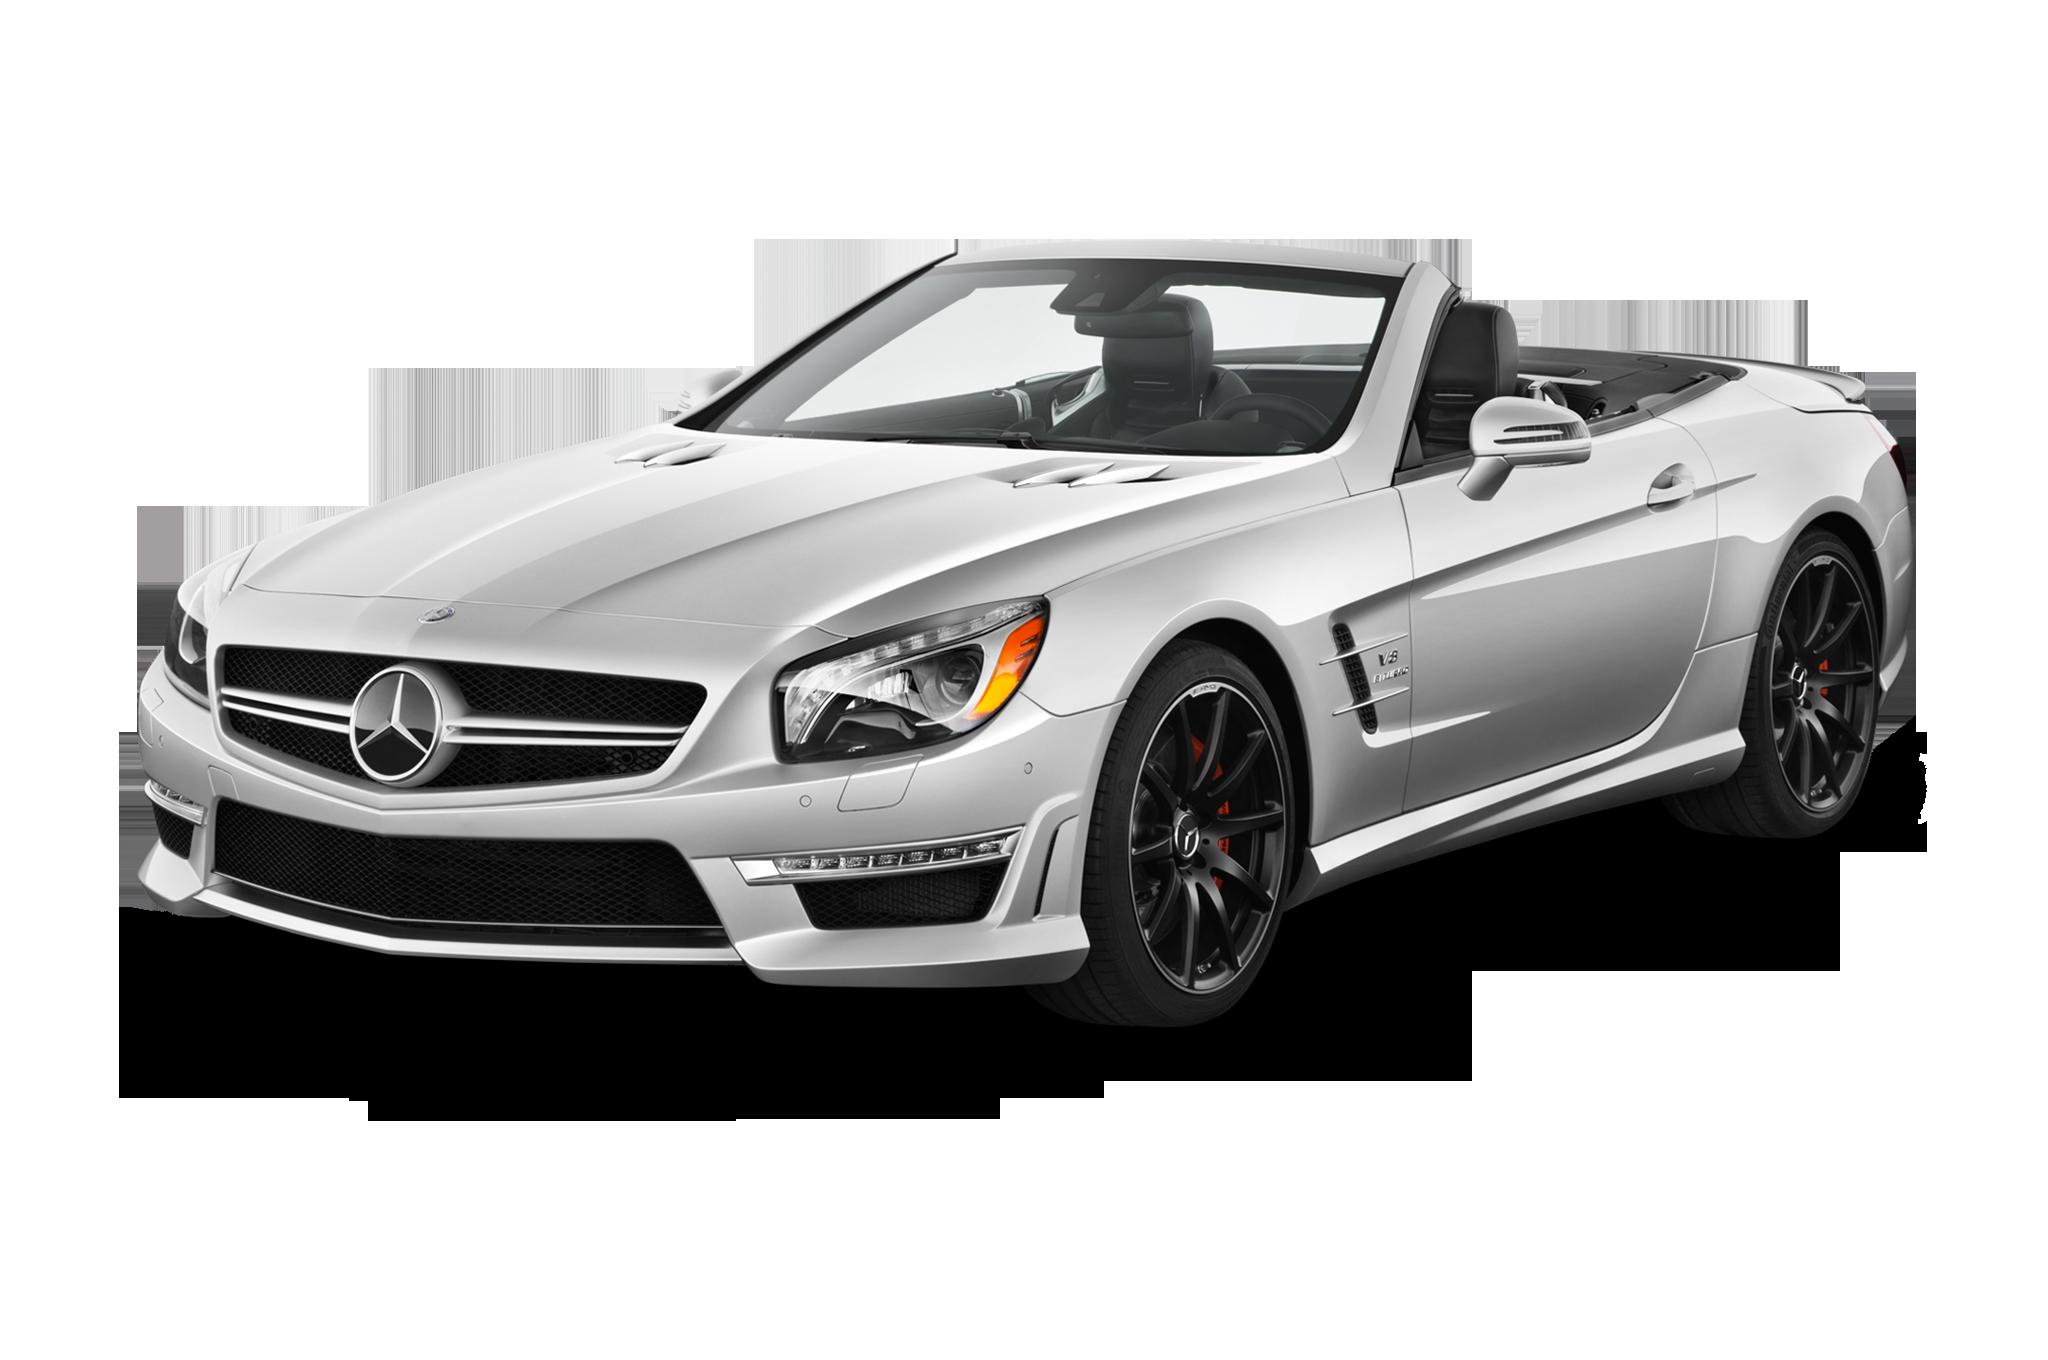 Mercedes S Class Safety Test